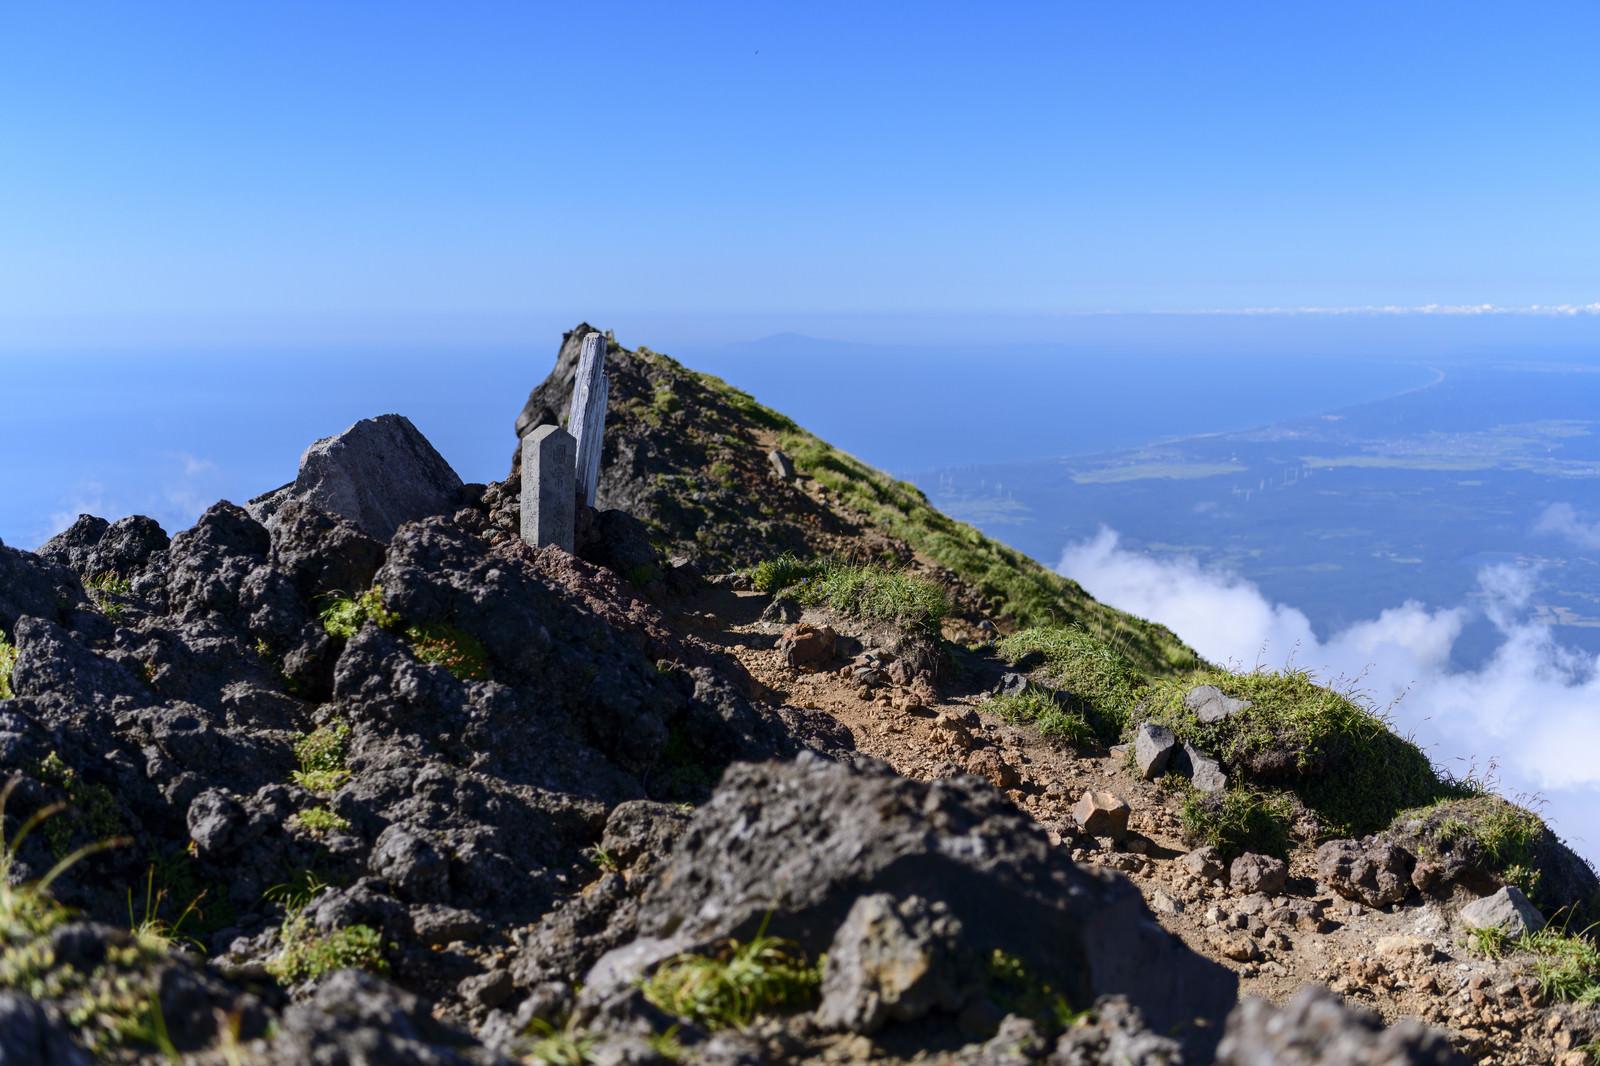 「鳥海山外輪七高山付近の景色」の写真